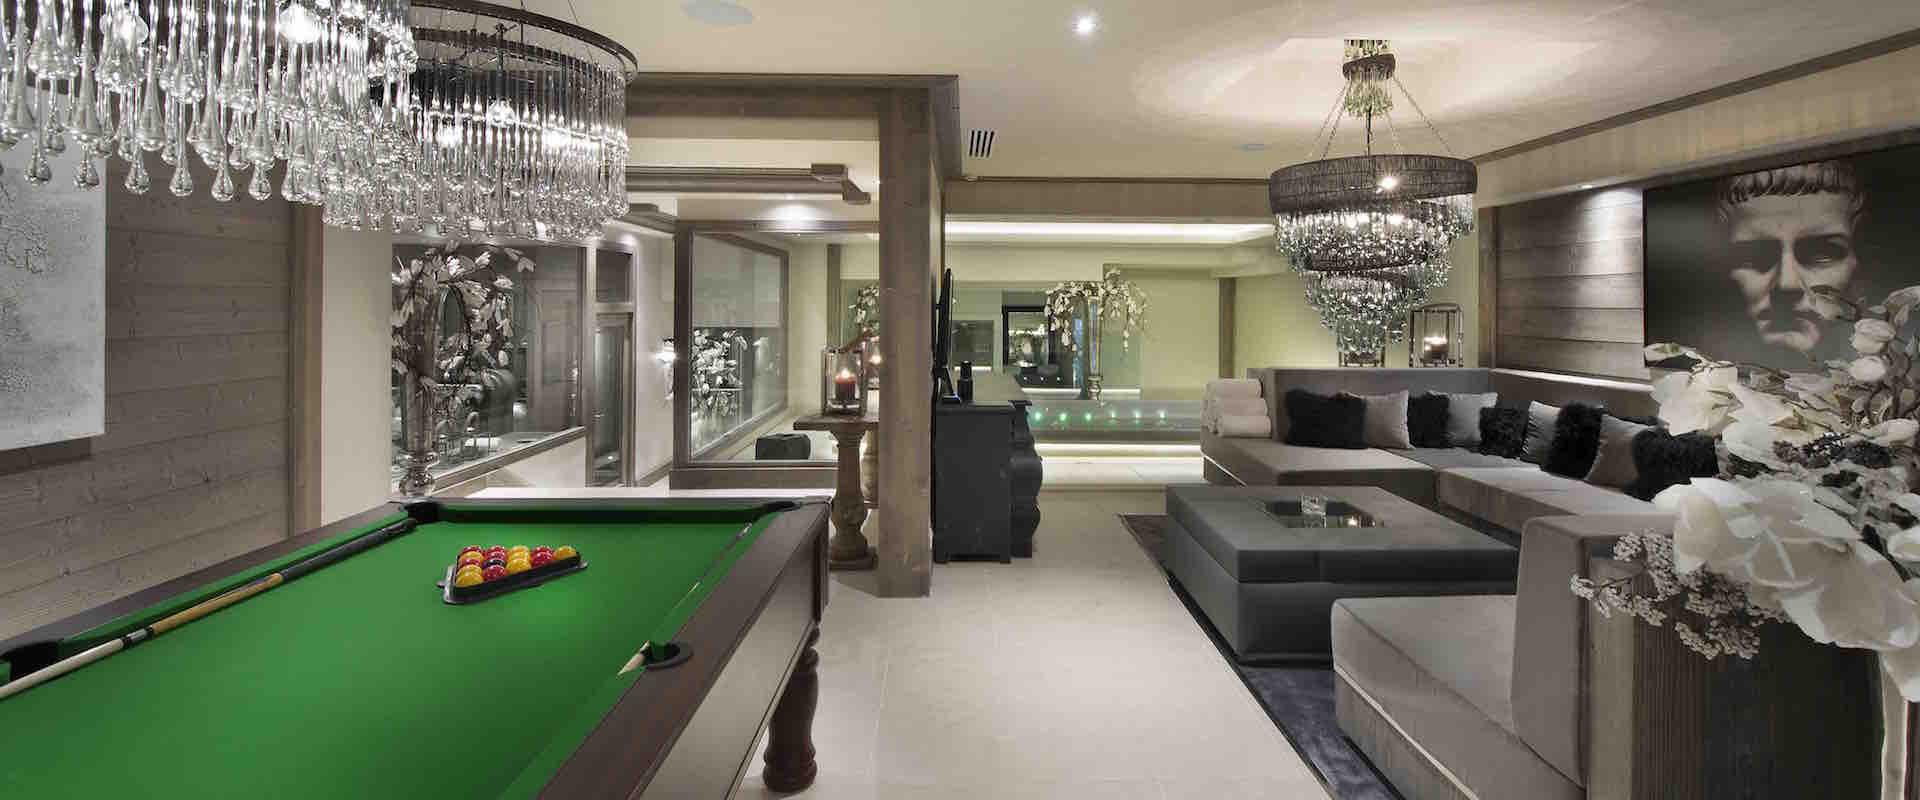 esmeralda-luxury-villas_chalet-marilyn5